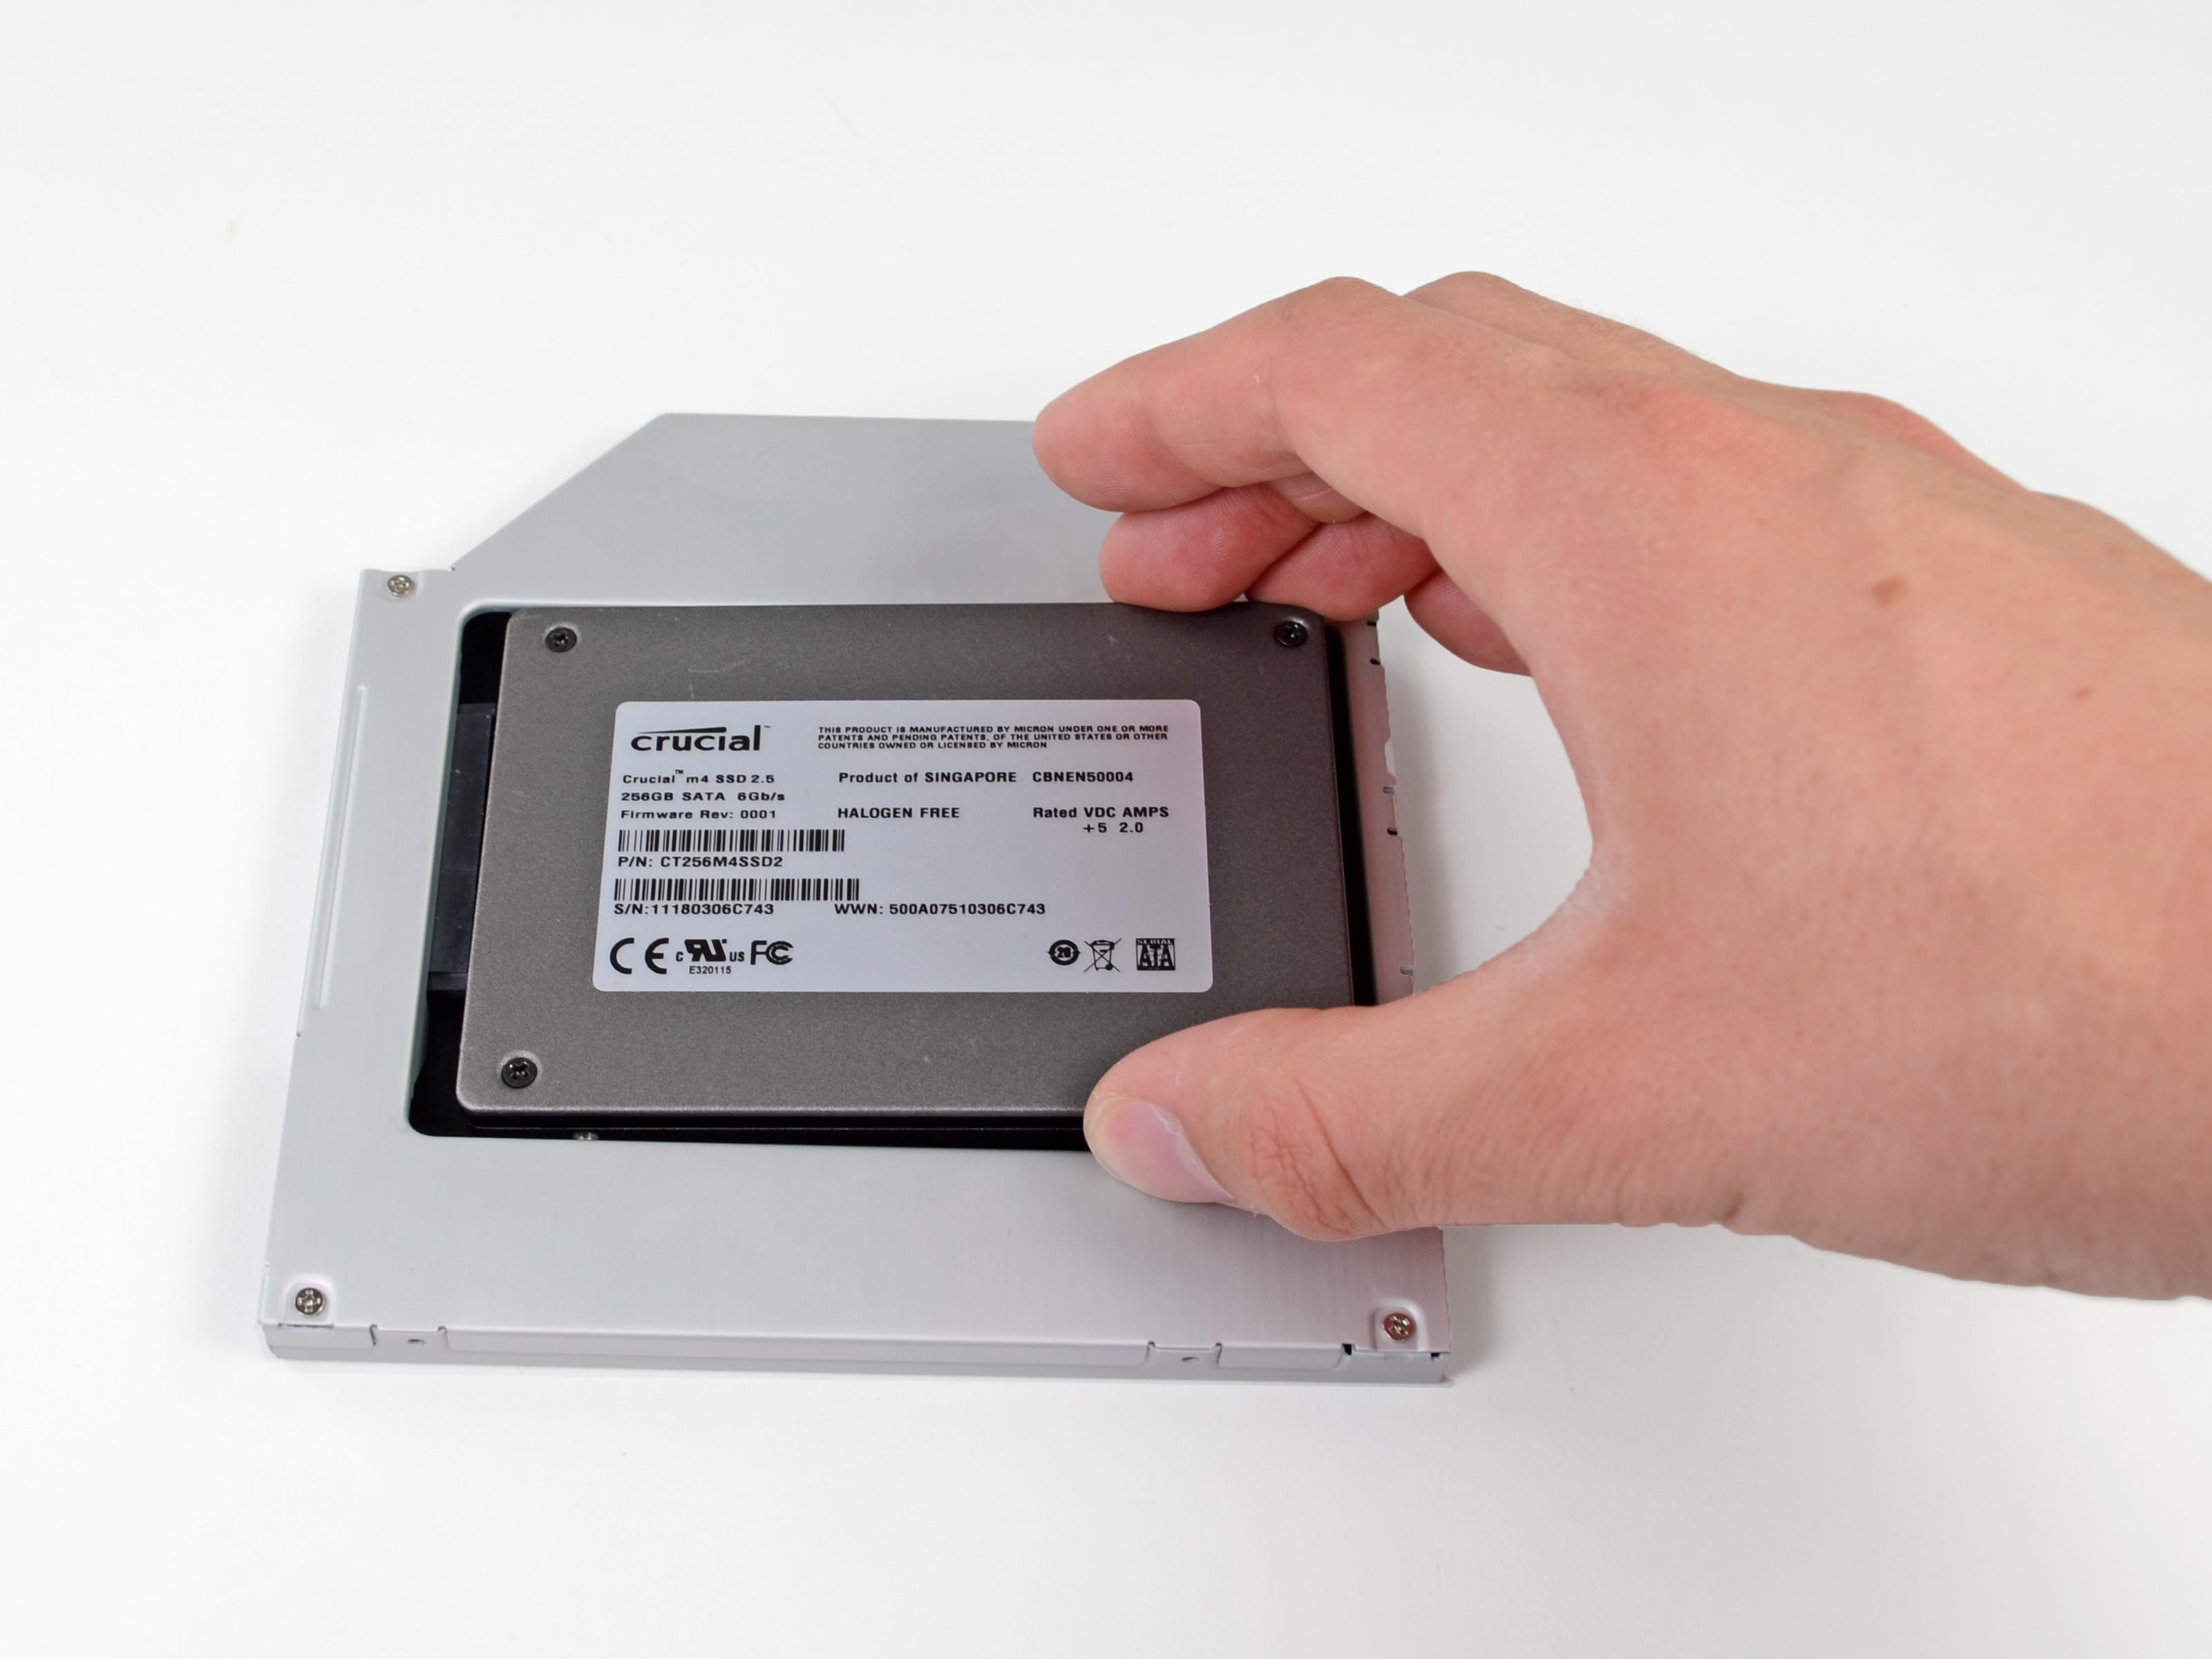 Installing Macbook Unibody Model A1342 Dual Hard Drive Ifixit Hardisk Internal Hardis Laptop Samsung Ssd 850 Evo 25 Inch Sata 250gb Repair Guide